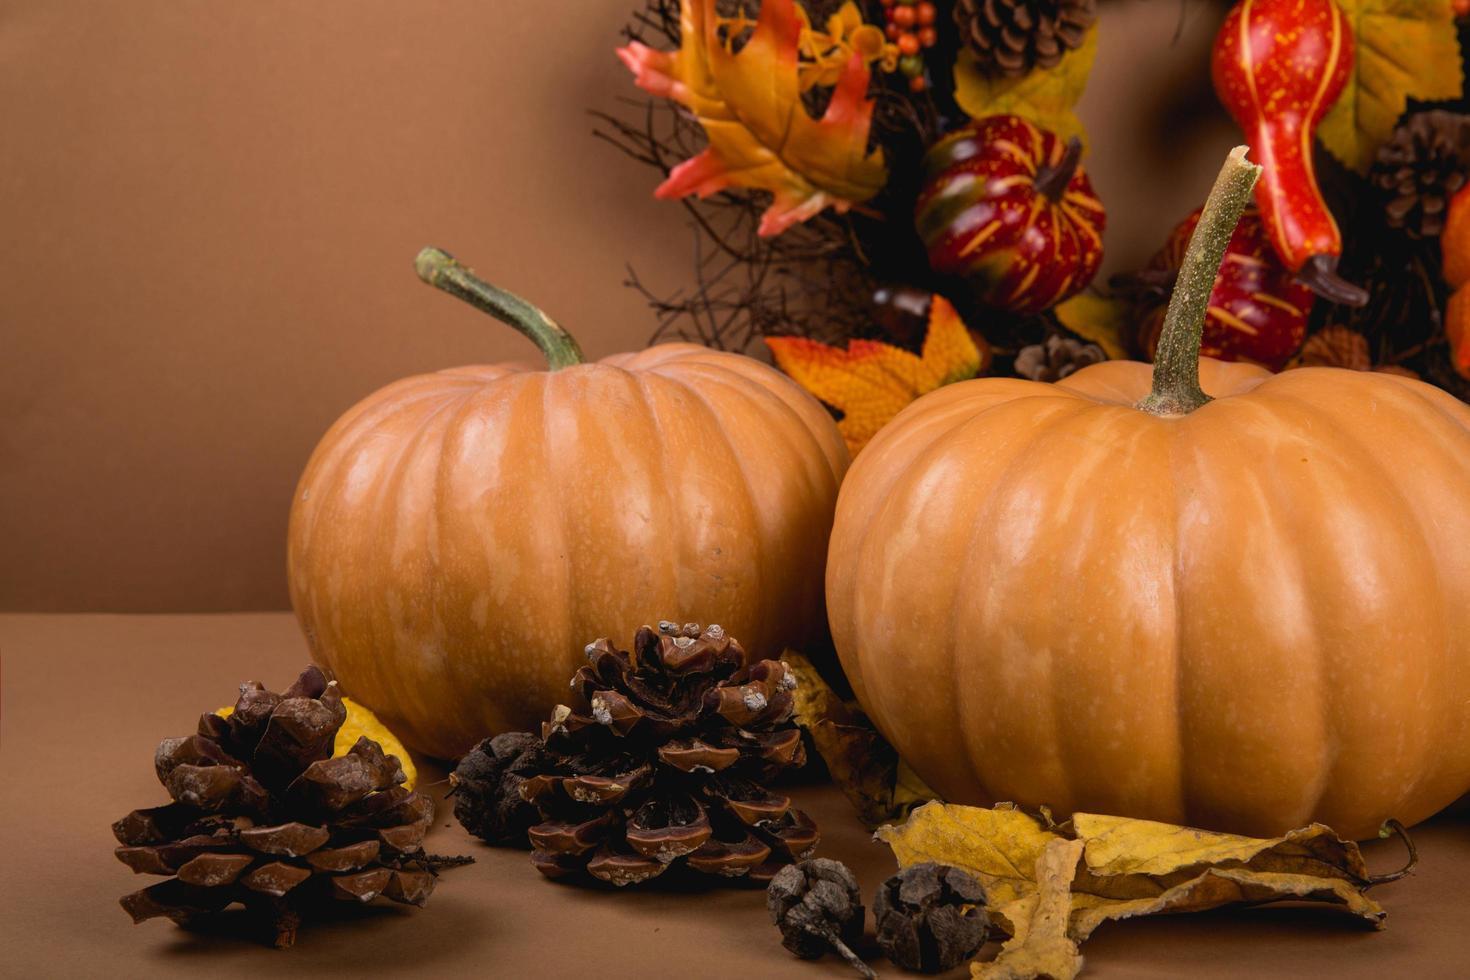 Two pumpkins on decorative backdrop photo